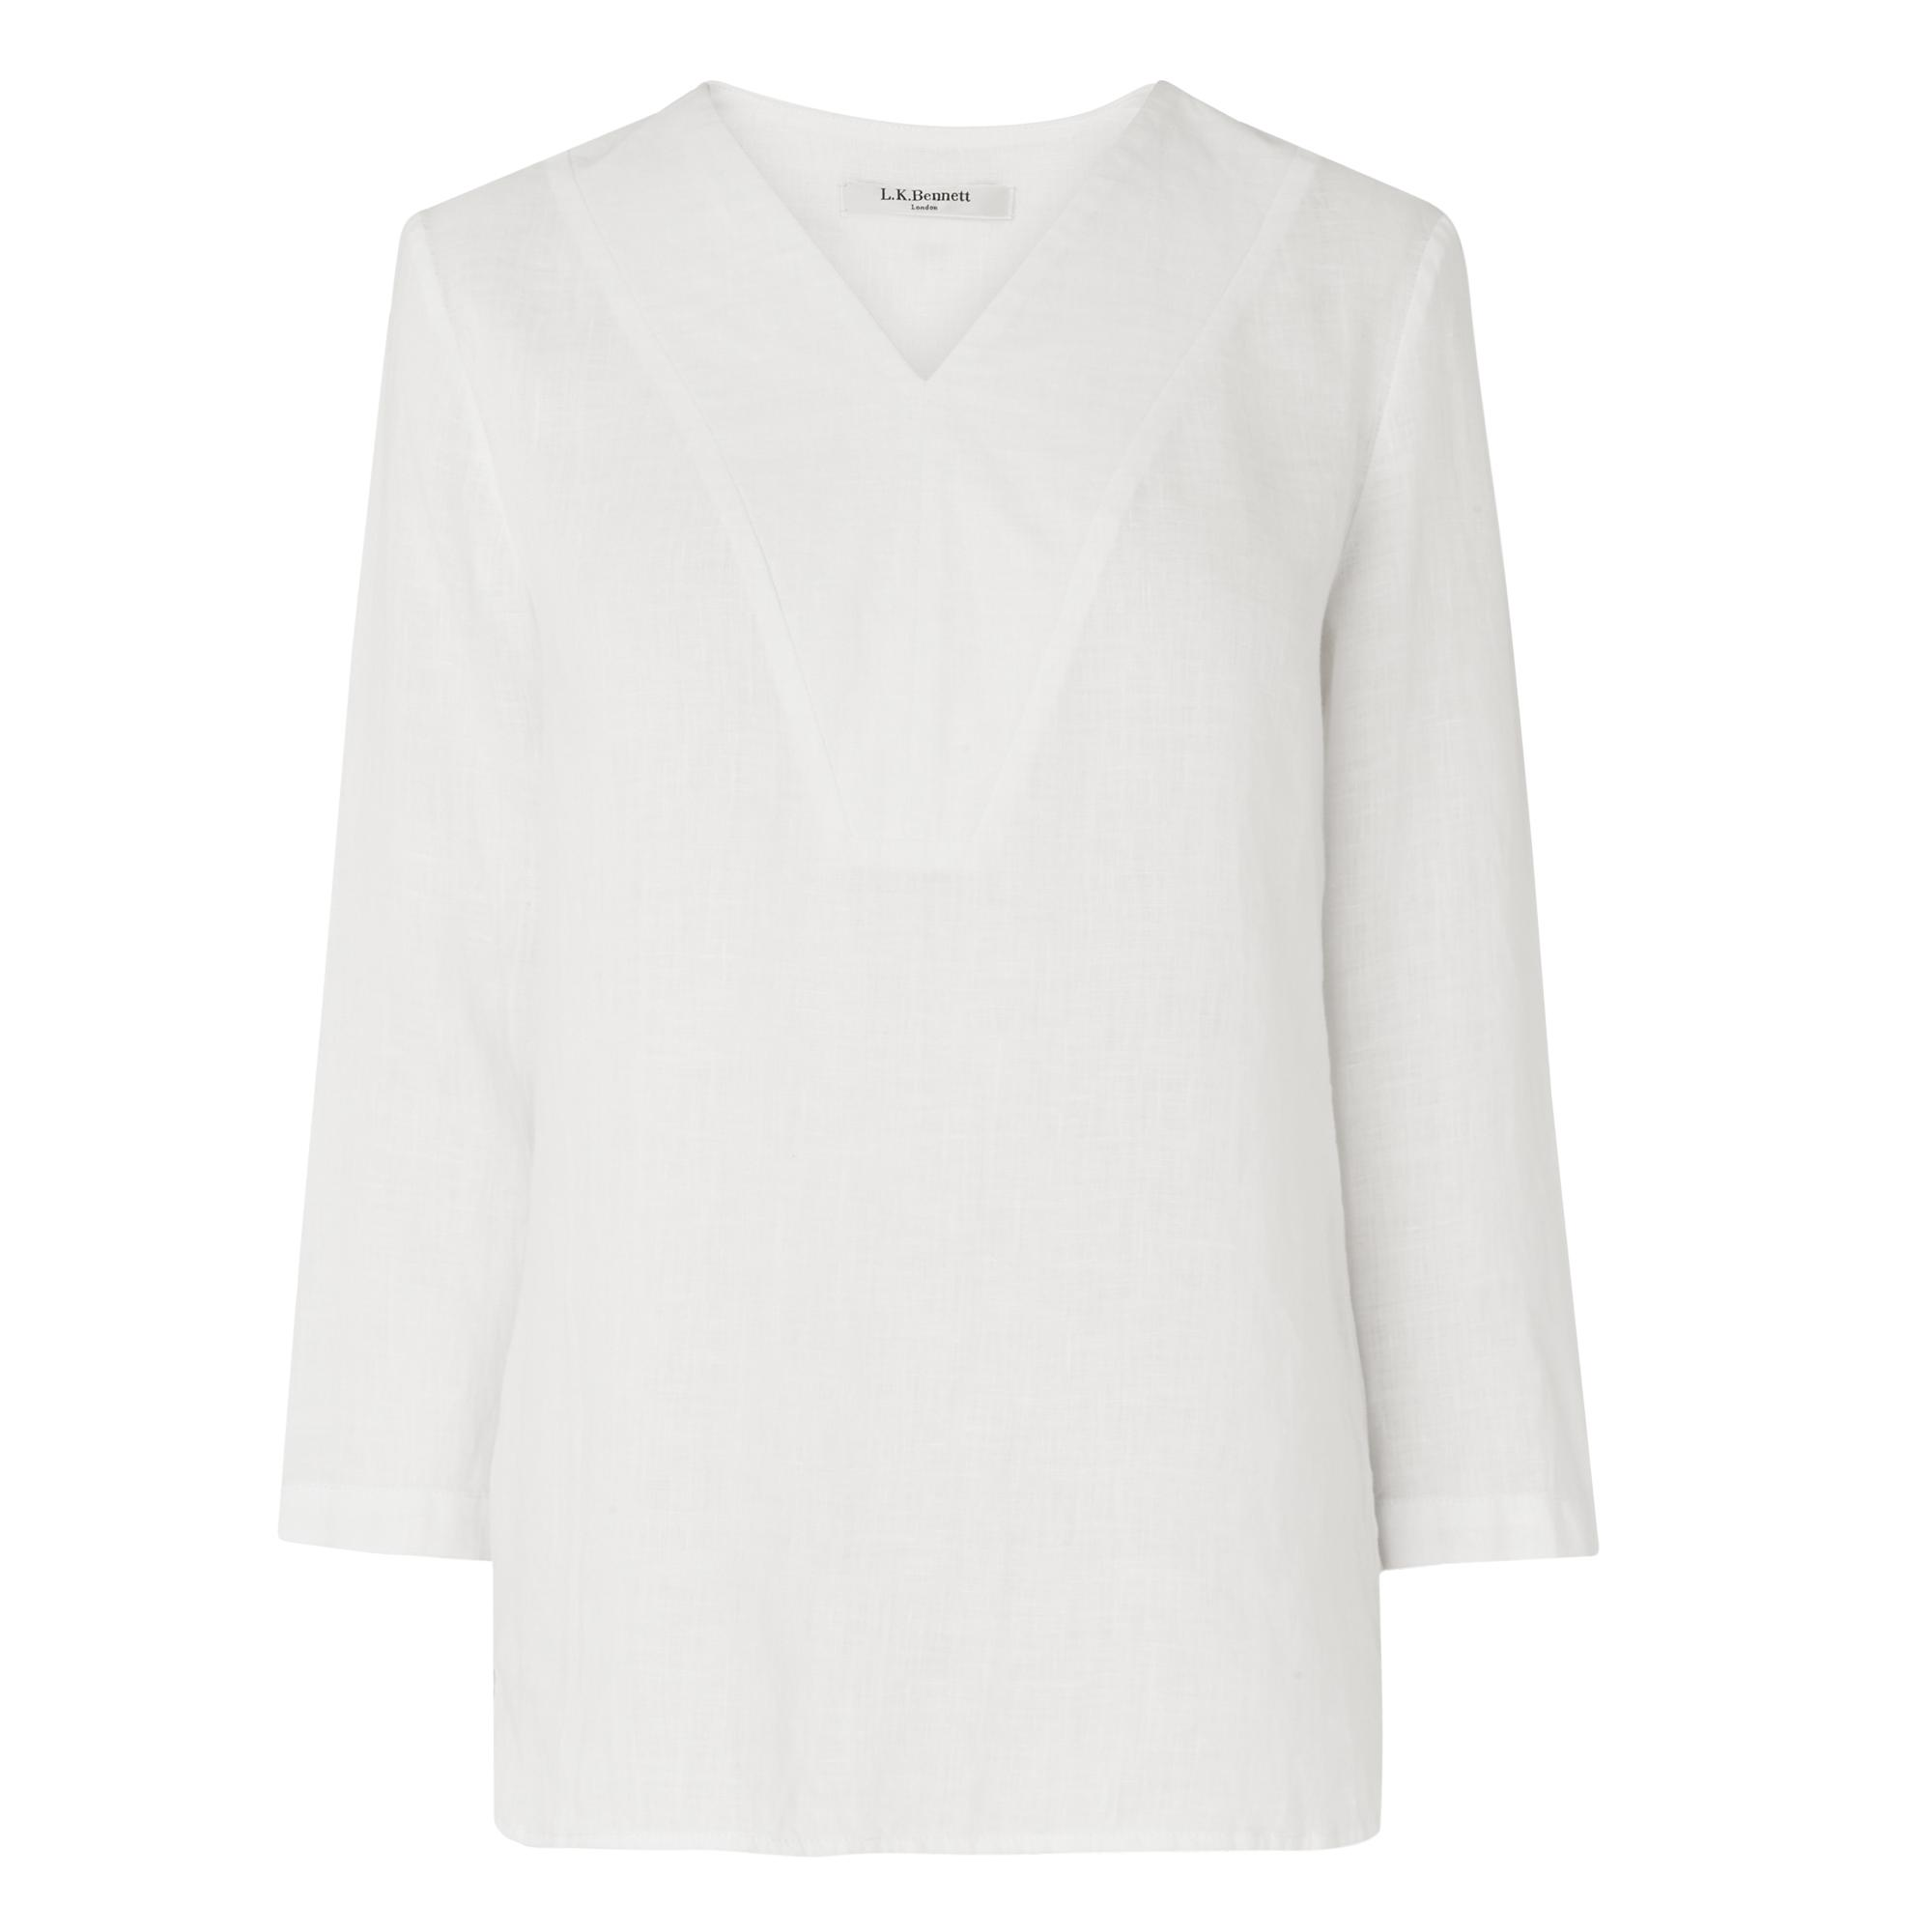 Alania White Linen Blouse